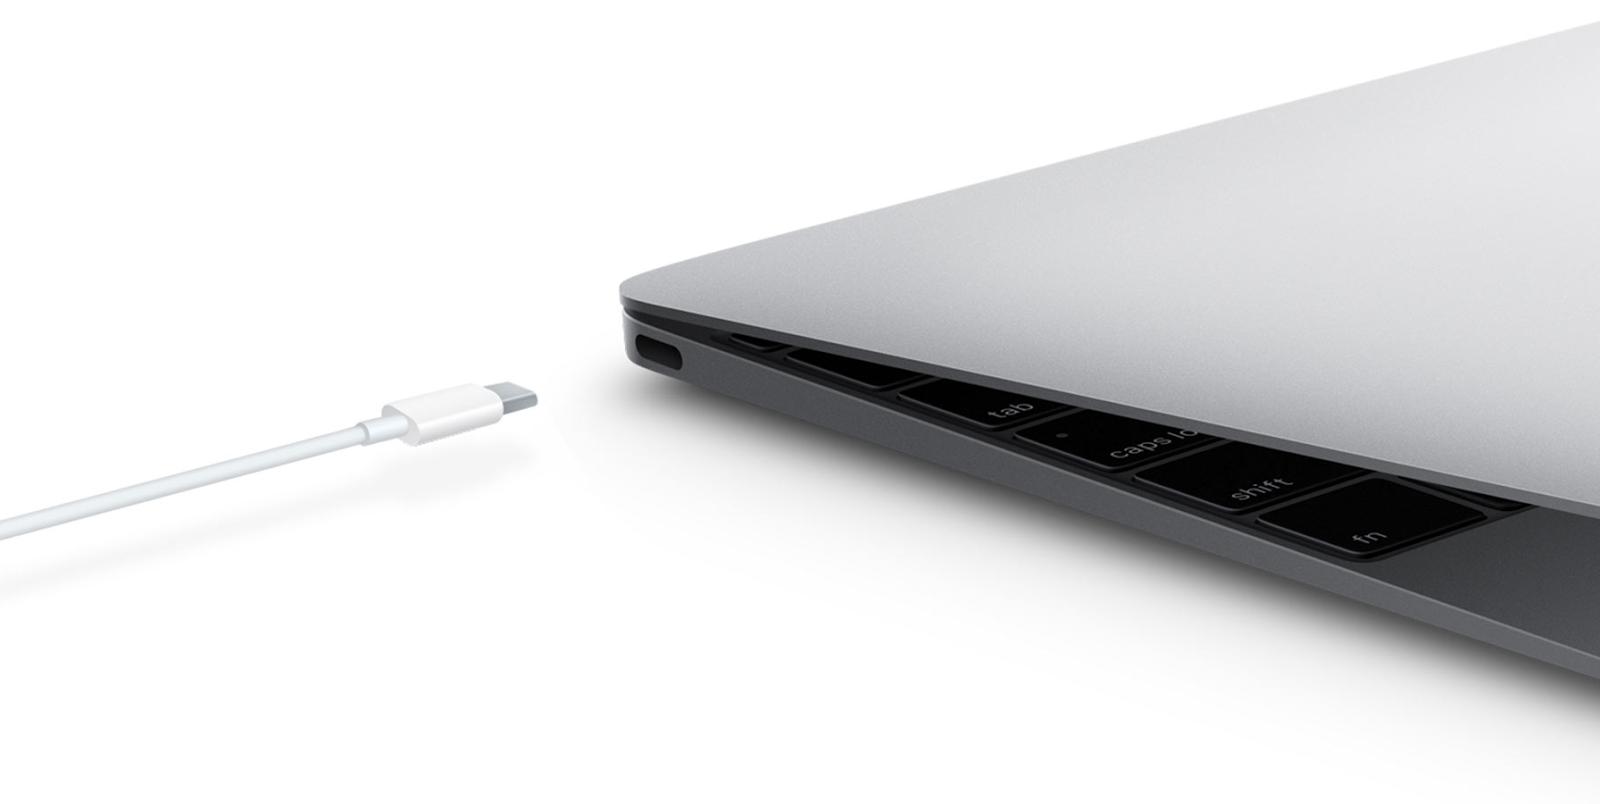 Single USB-C Port for 5 Ports